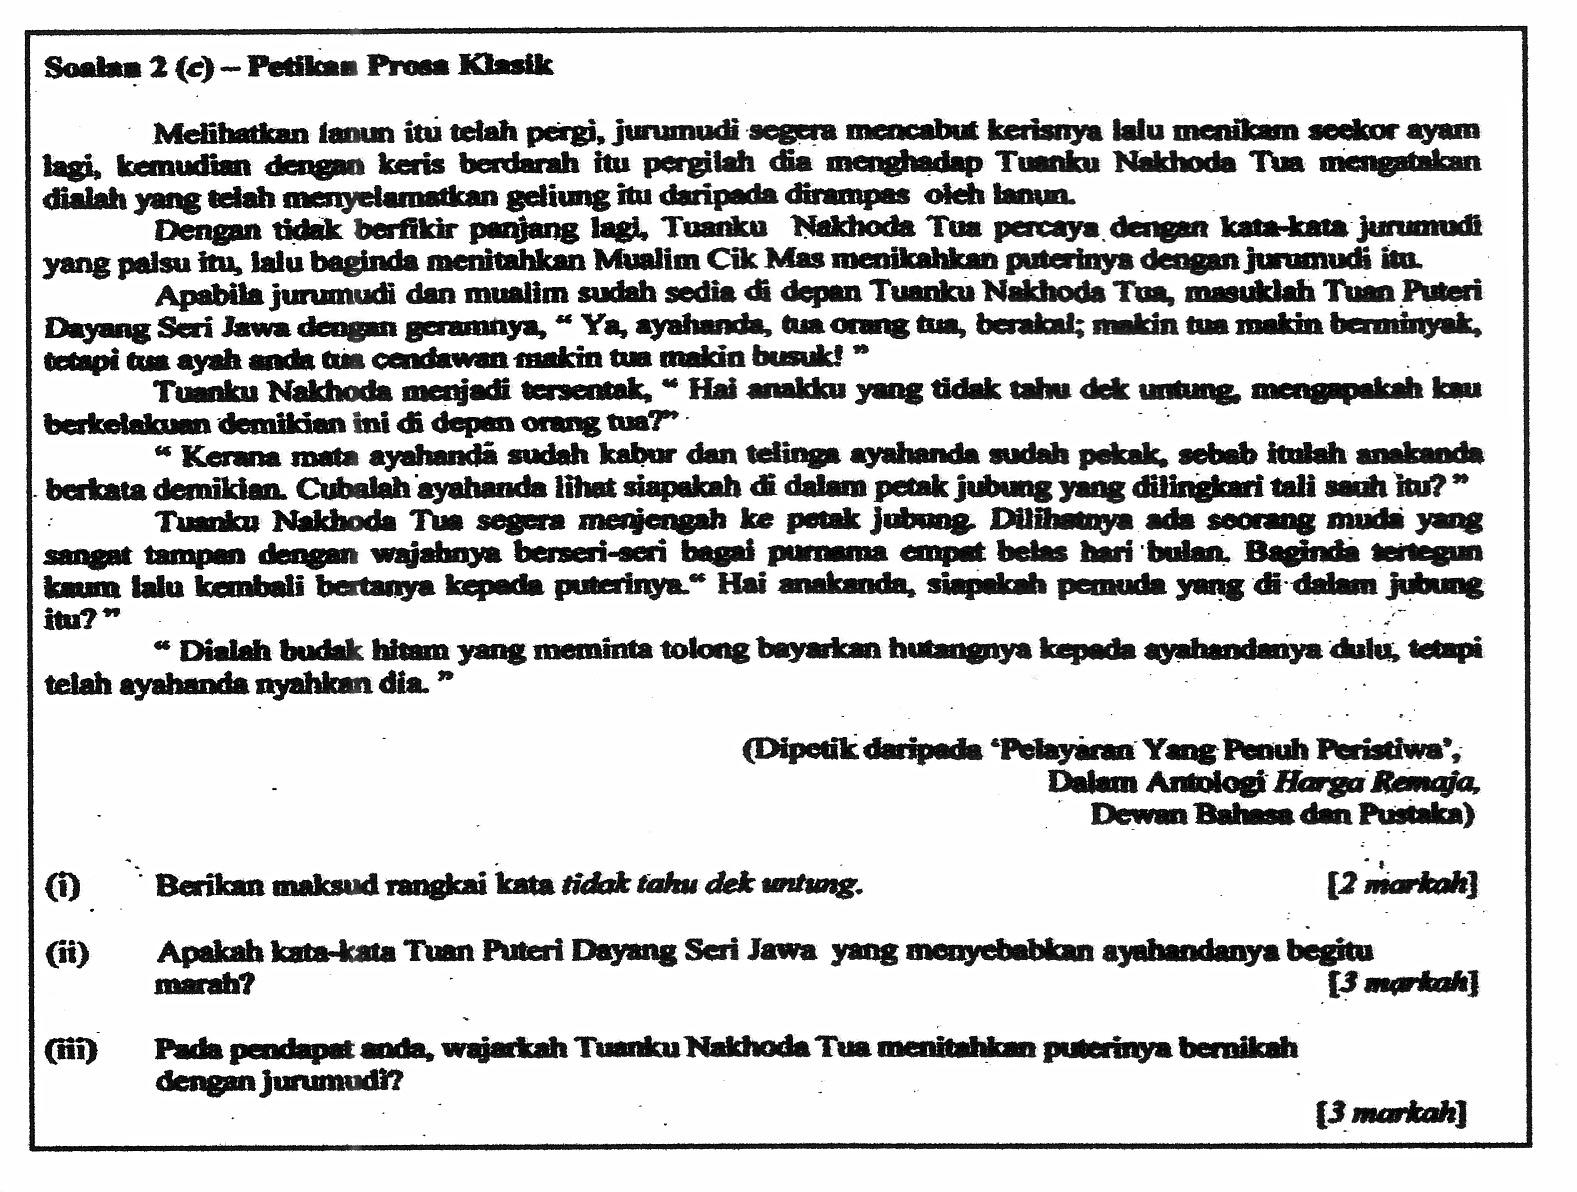 Contoh Soalan Komsas Tingkatan 3 Pt3 U Soalan